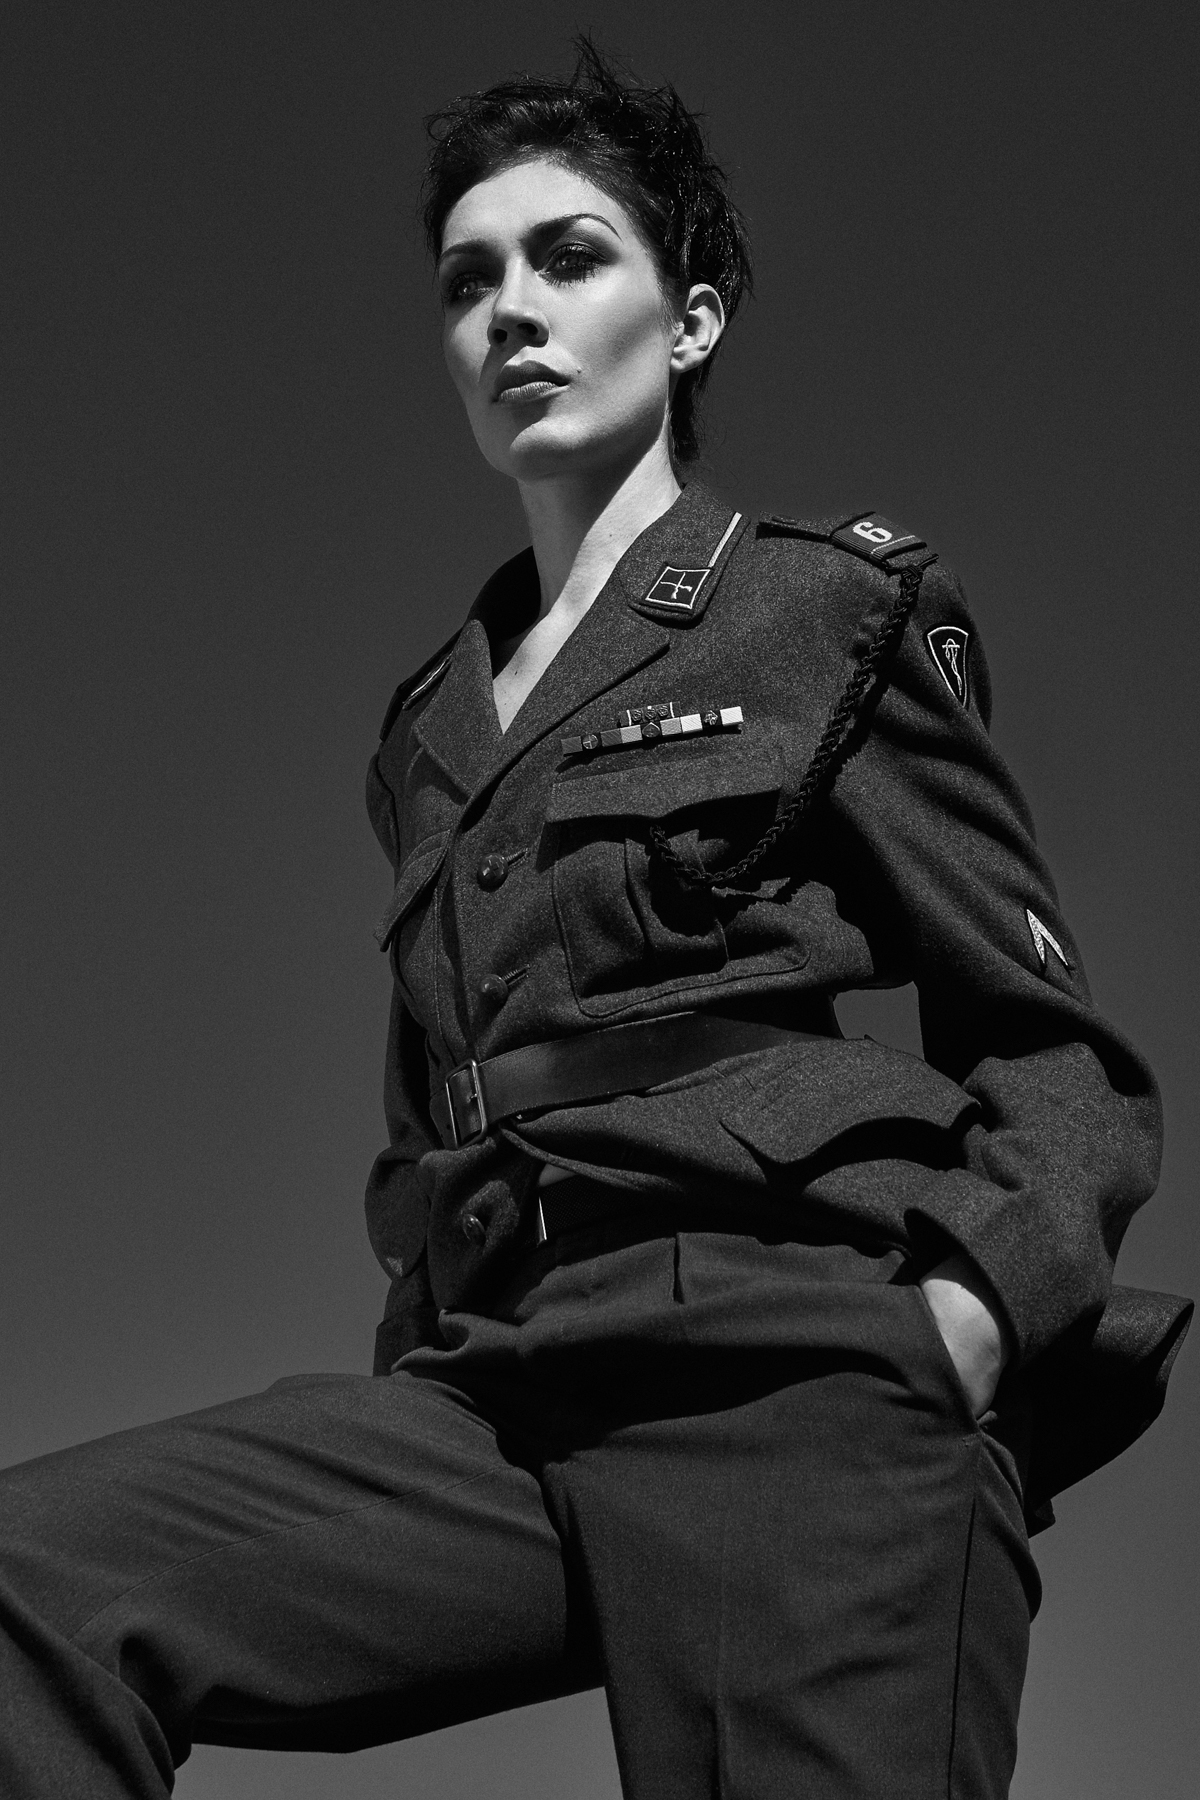 militaire photoshoot